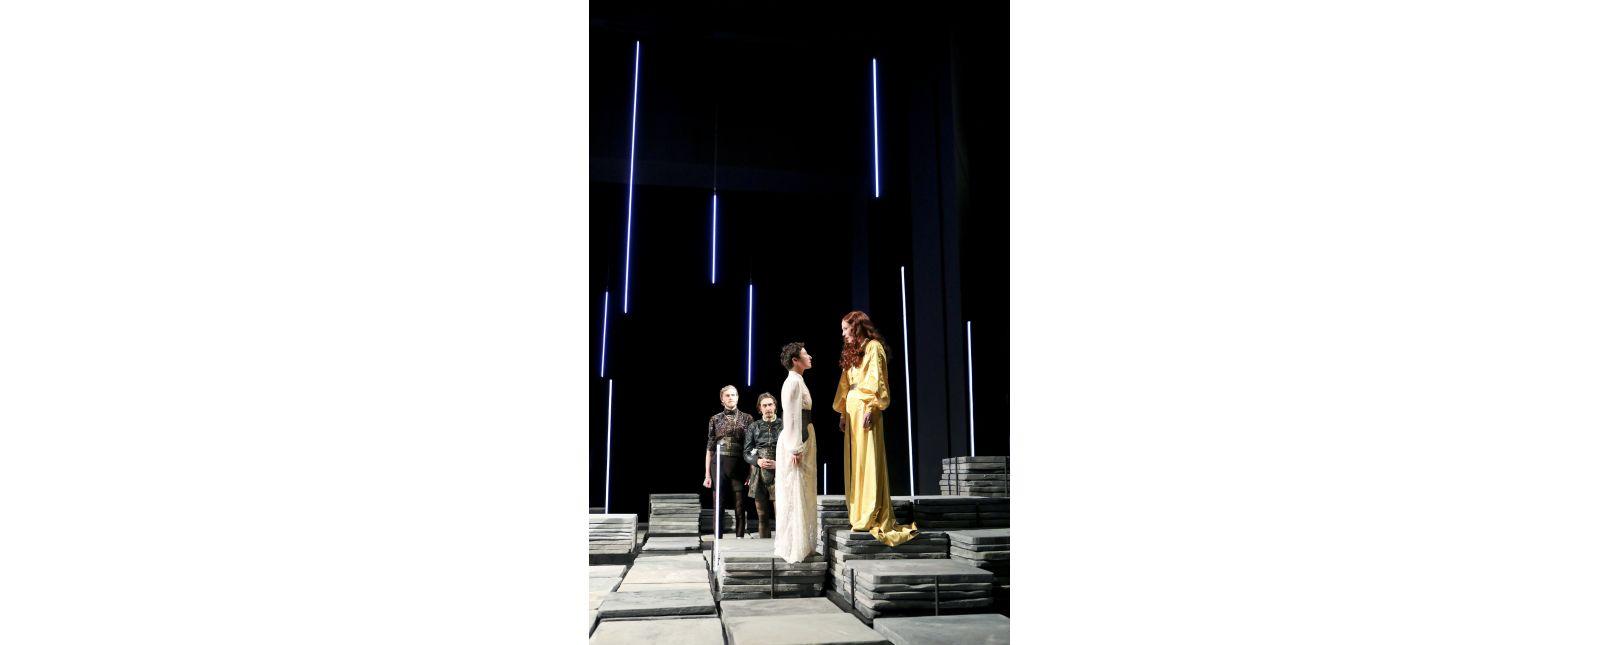 Maria Stuart // Thieß Brammer / Victor Calero / Elisabeth Kopp / Anja Schweitzer // 2020 // Birgit Hupfeld